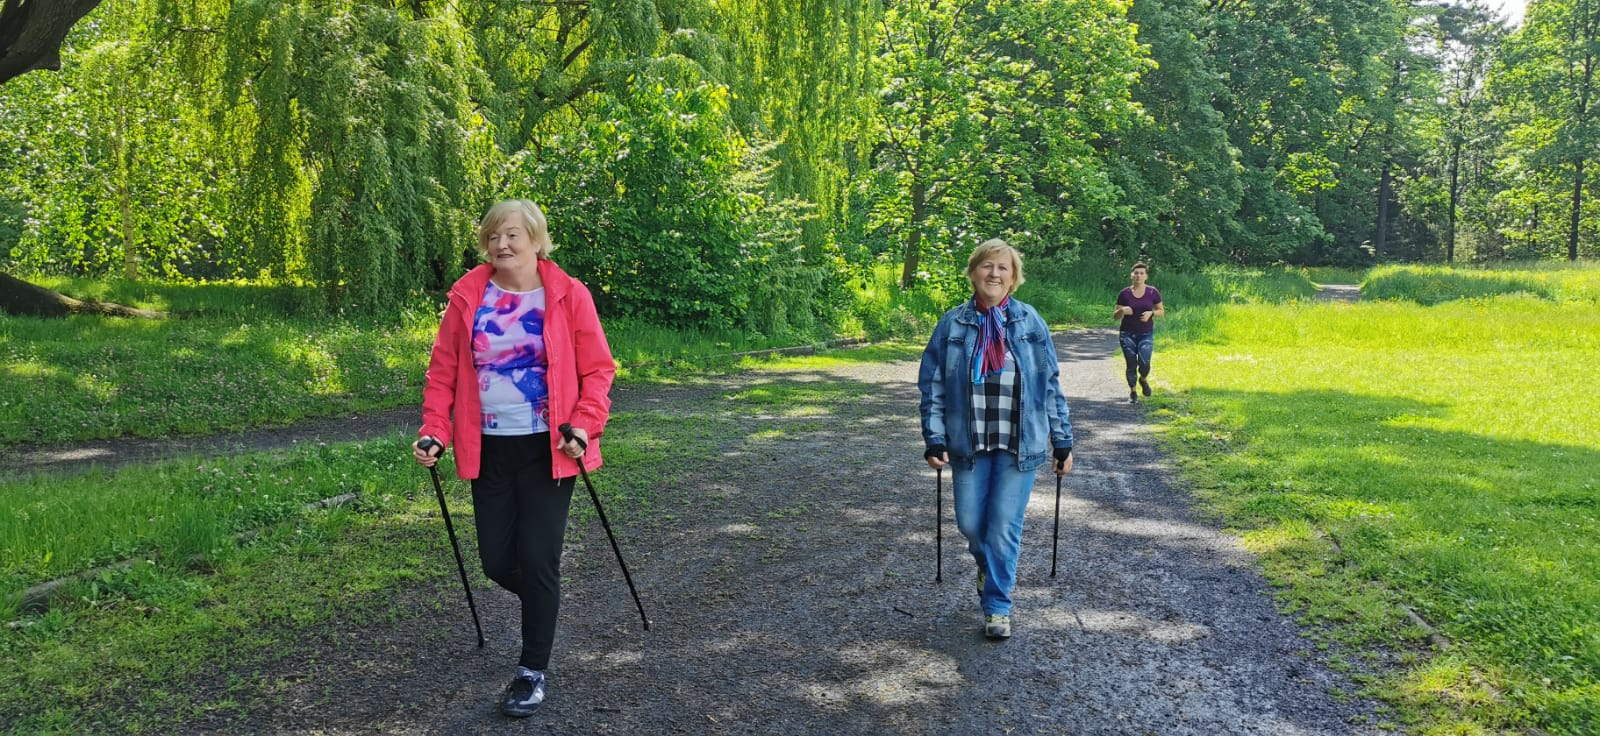 Nordic Walking w parku 2020r